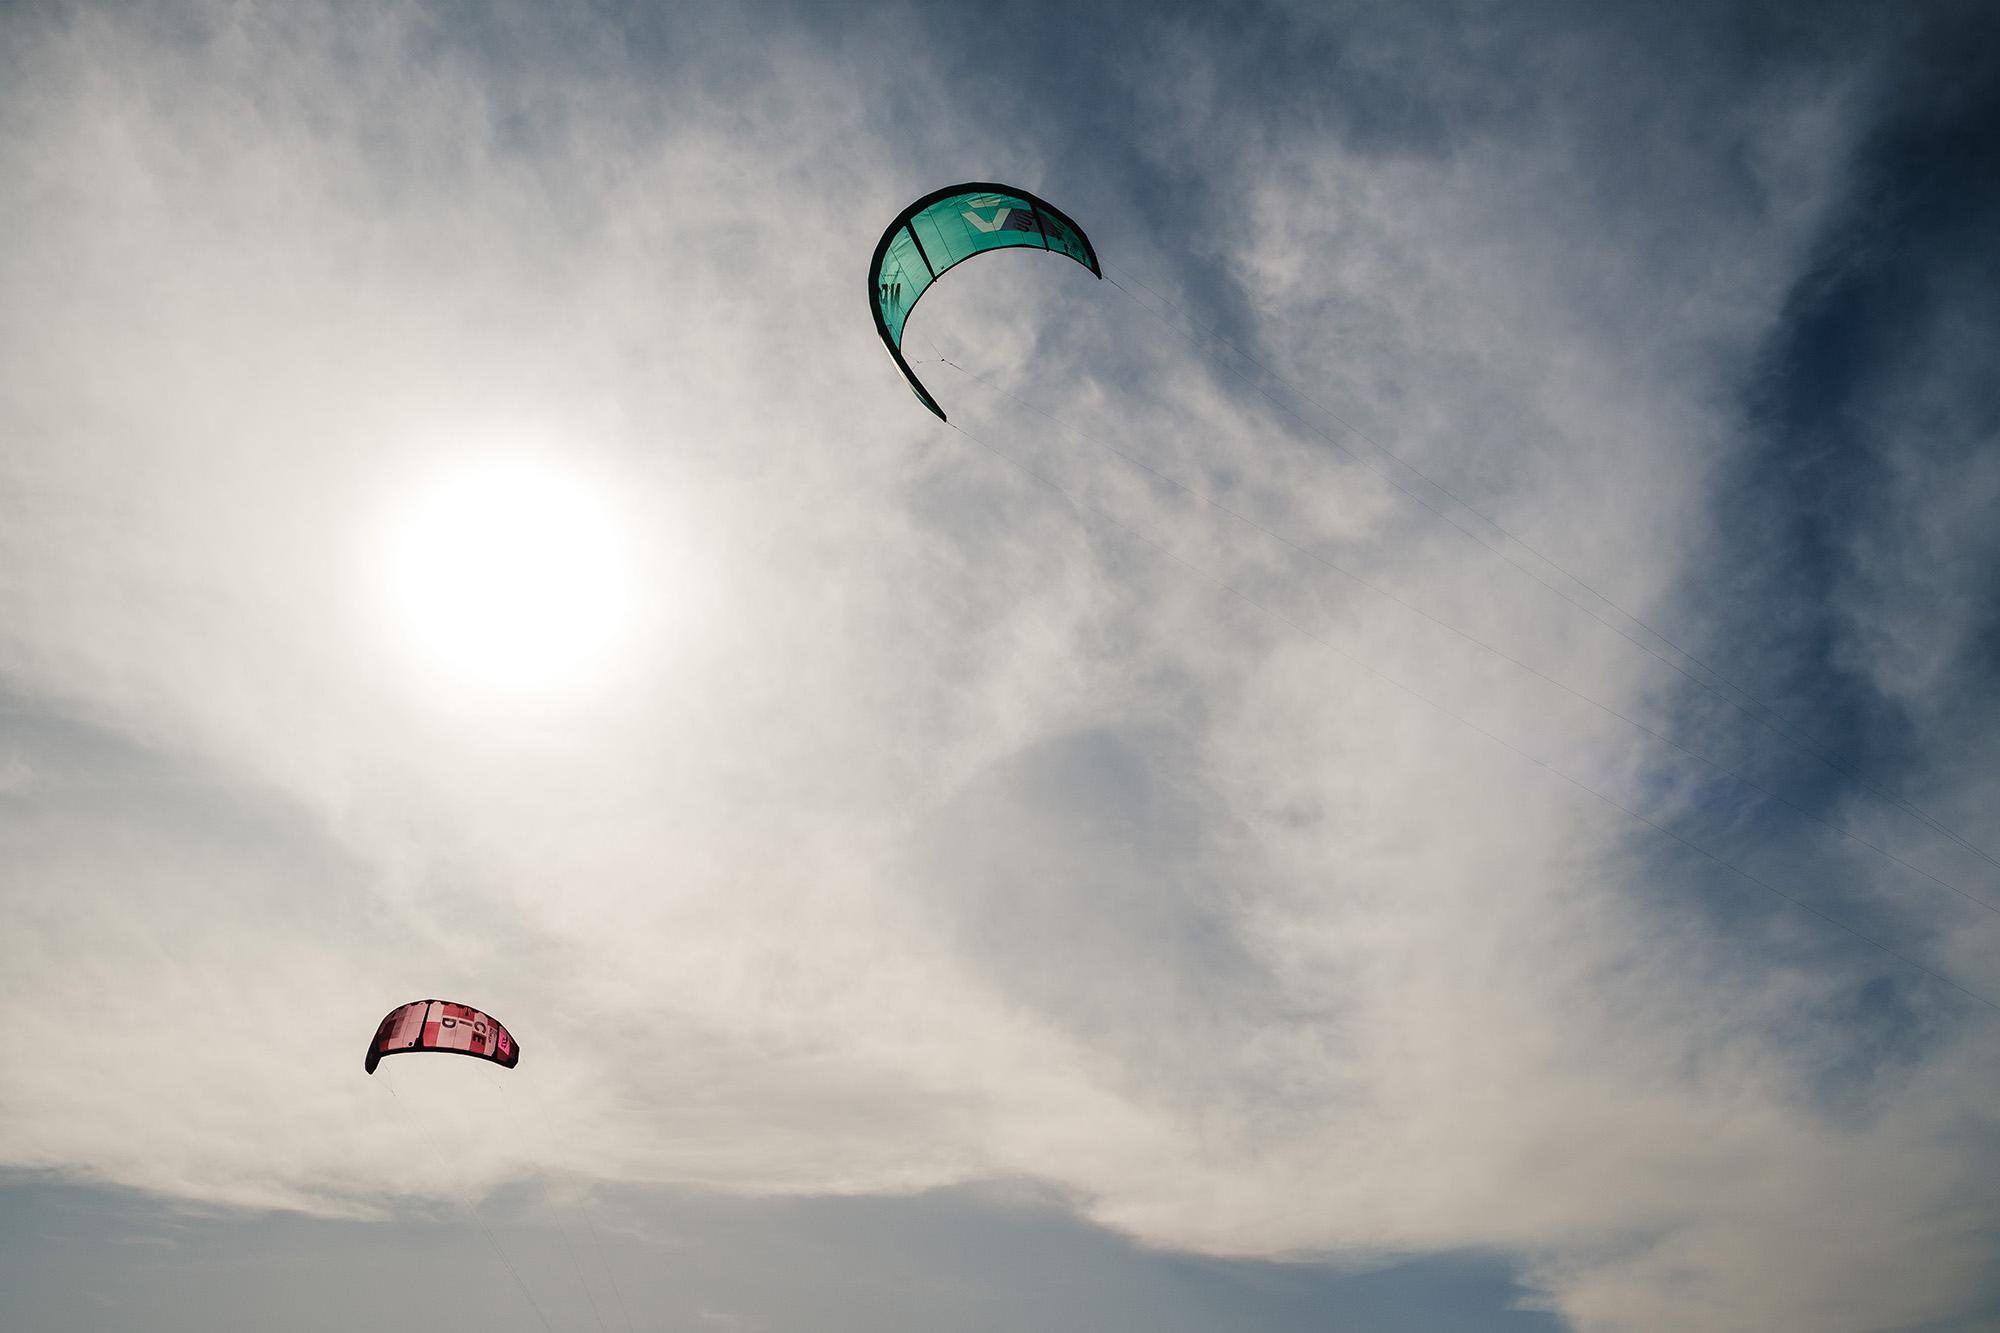 windsurfer lancing